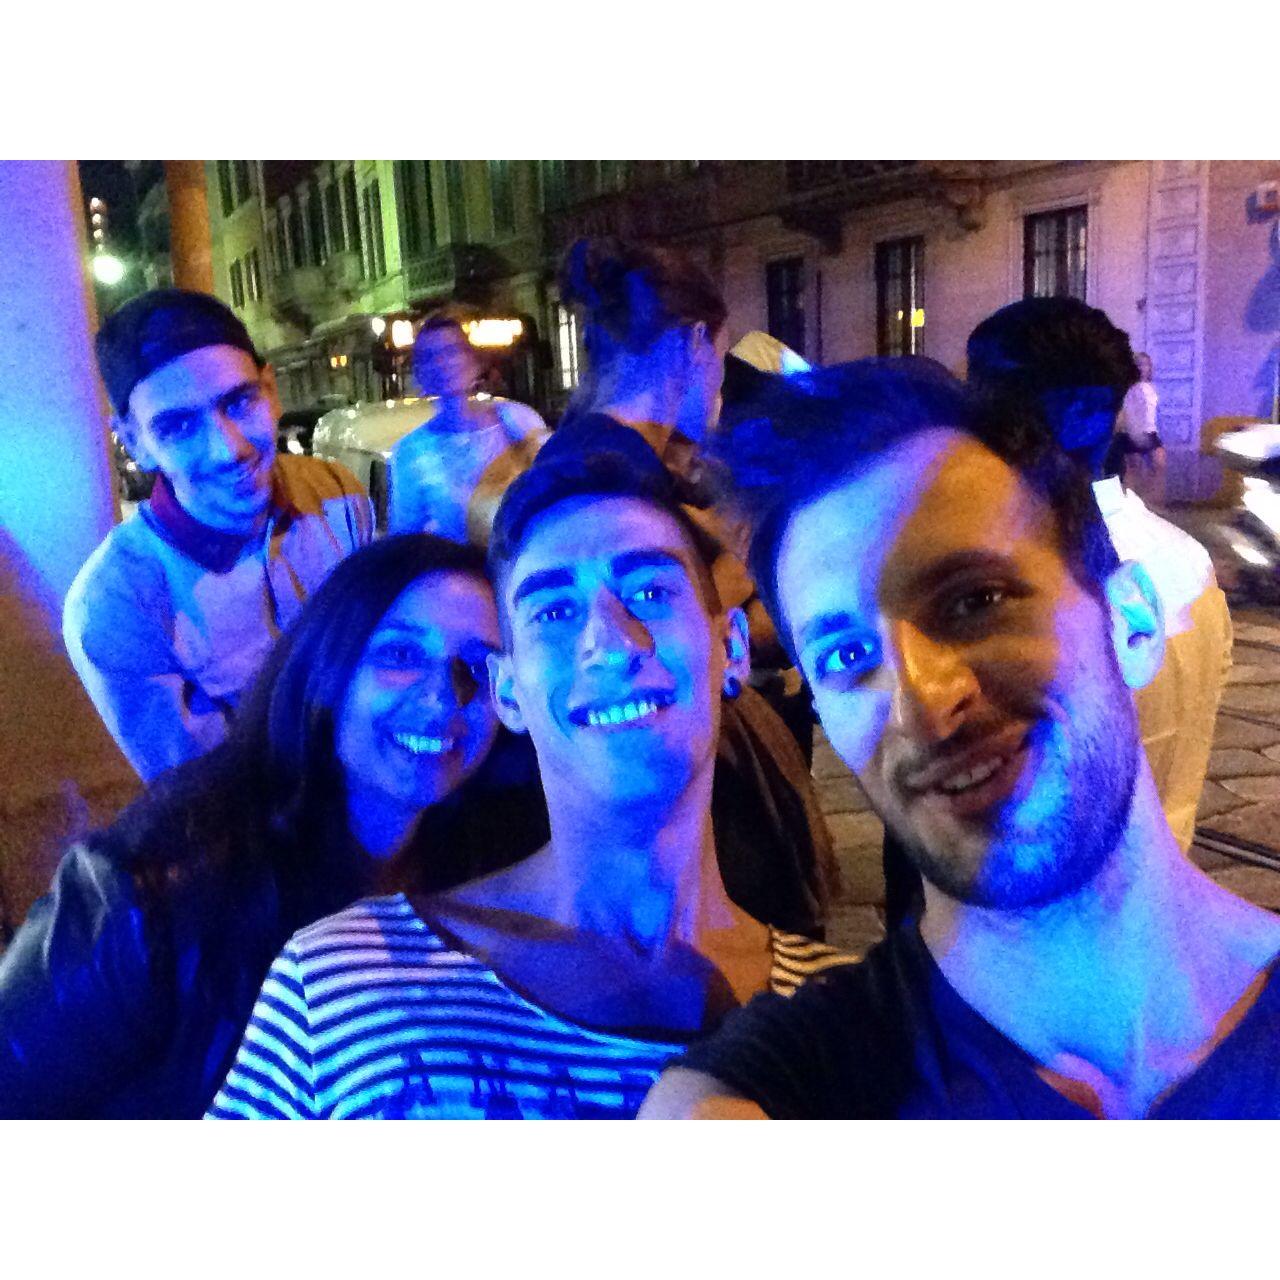 Vogue Fashion's Night 2014 Self-timer in Brera  #mybestfriends #voguefashionsnight2014 #milan #city #glam #day #life #like #moda #evening #love #tumblr #instagram #foursquare #swarm #facebook #pinterest #followme #kiss #filter #social_network